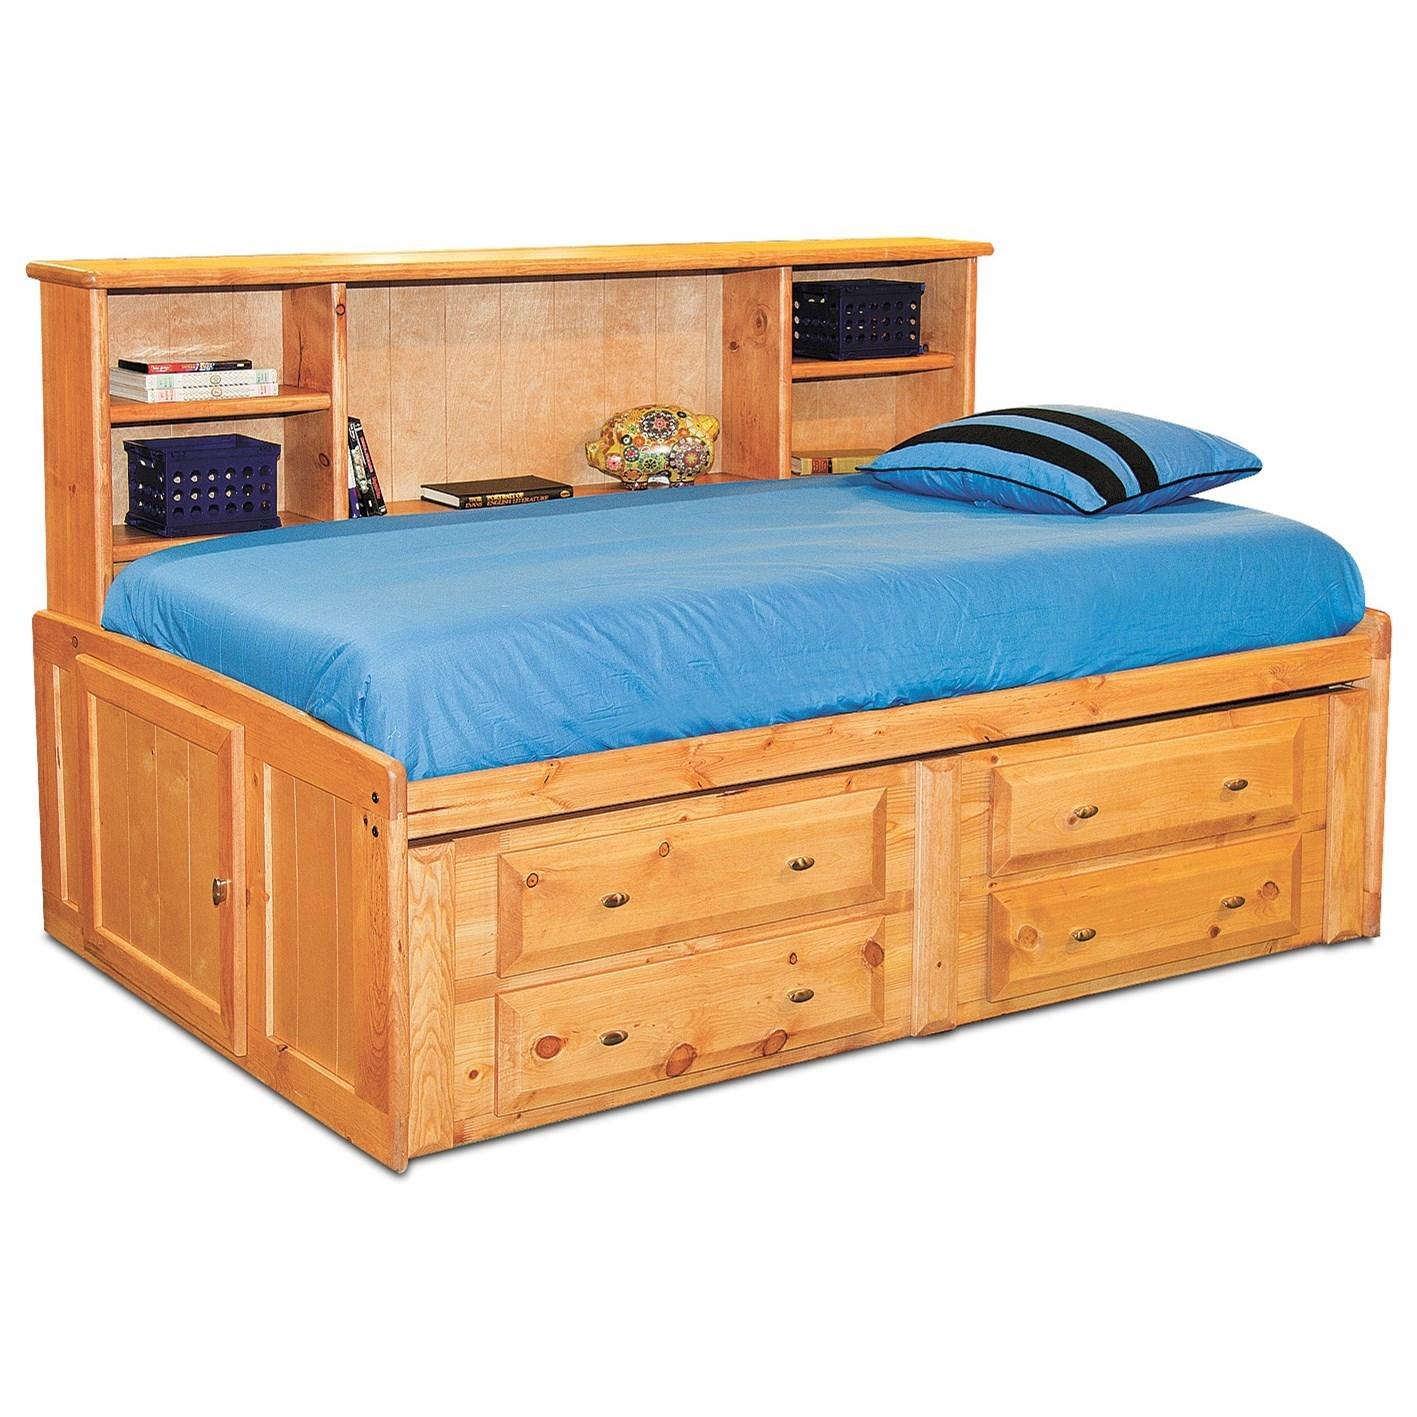 Trendwood Laguna  Full Roomsaver Bed  - Item Number: 4510CA+4513CA+4514CA+4545CA